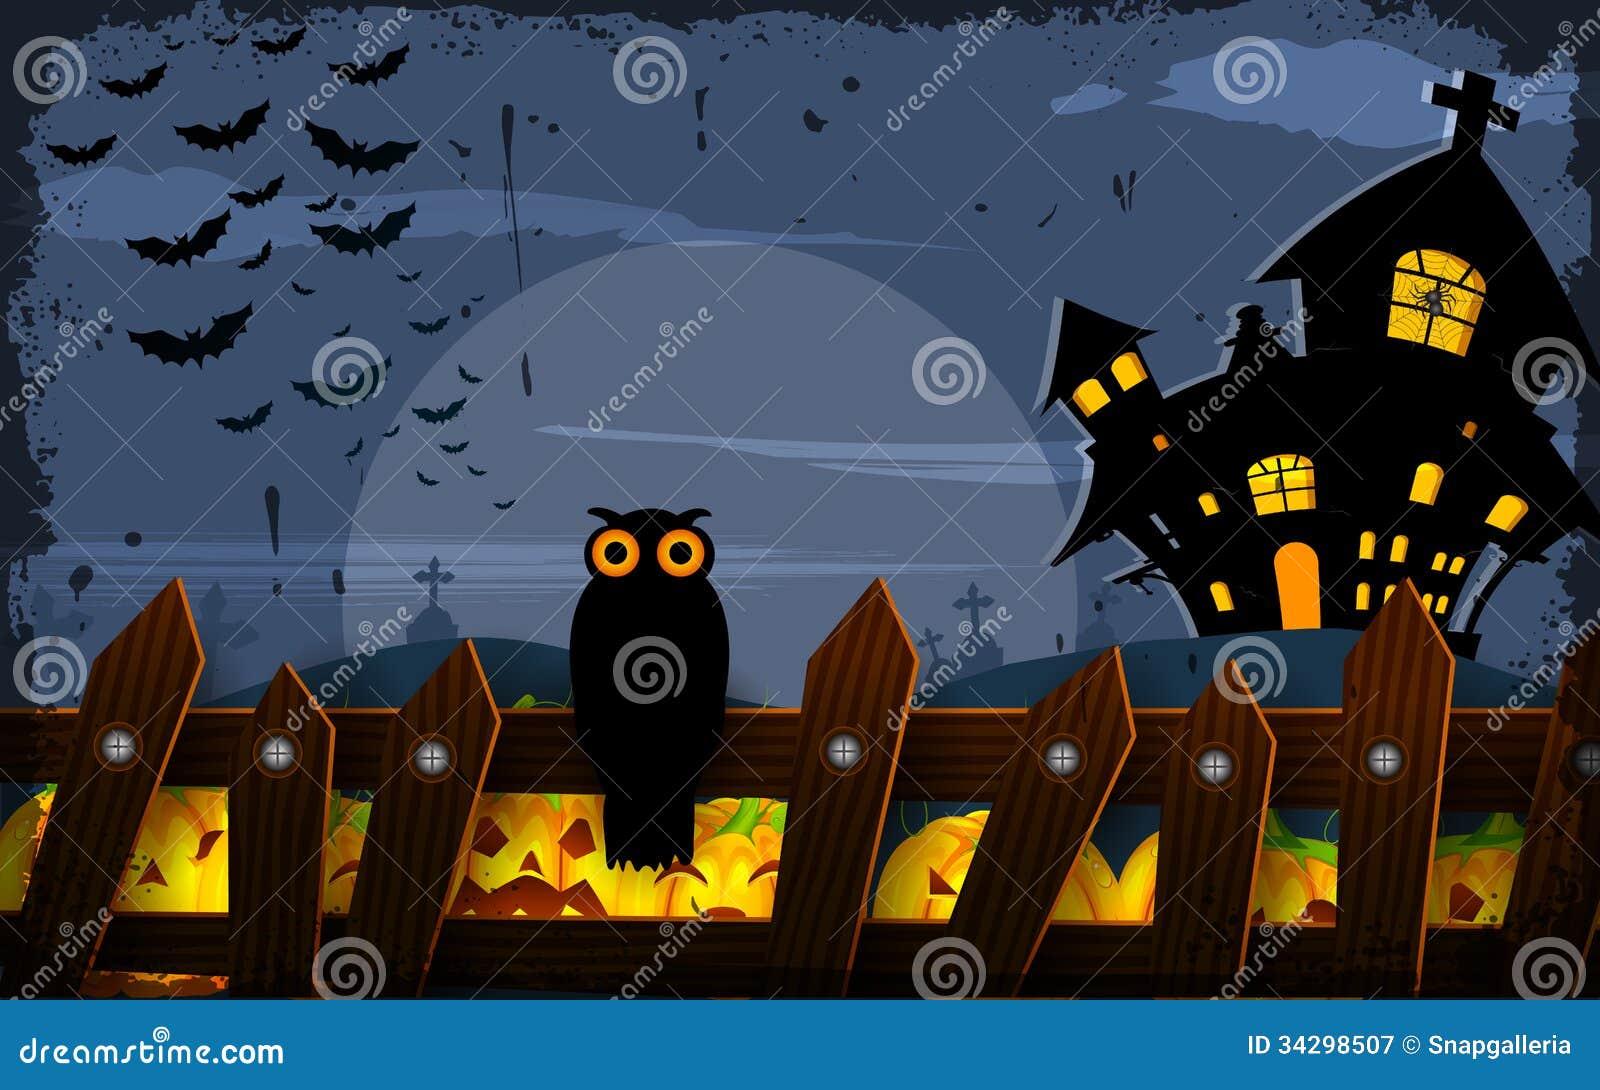 Spirit Halloween Okc